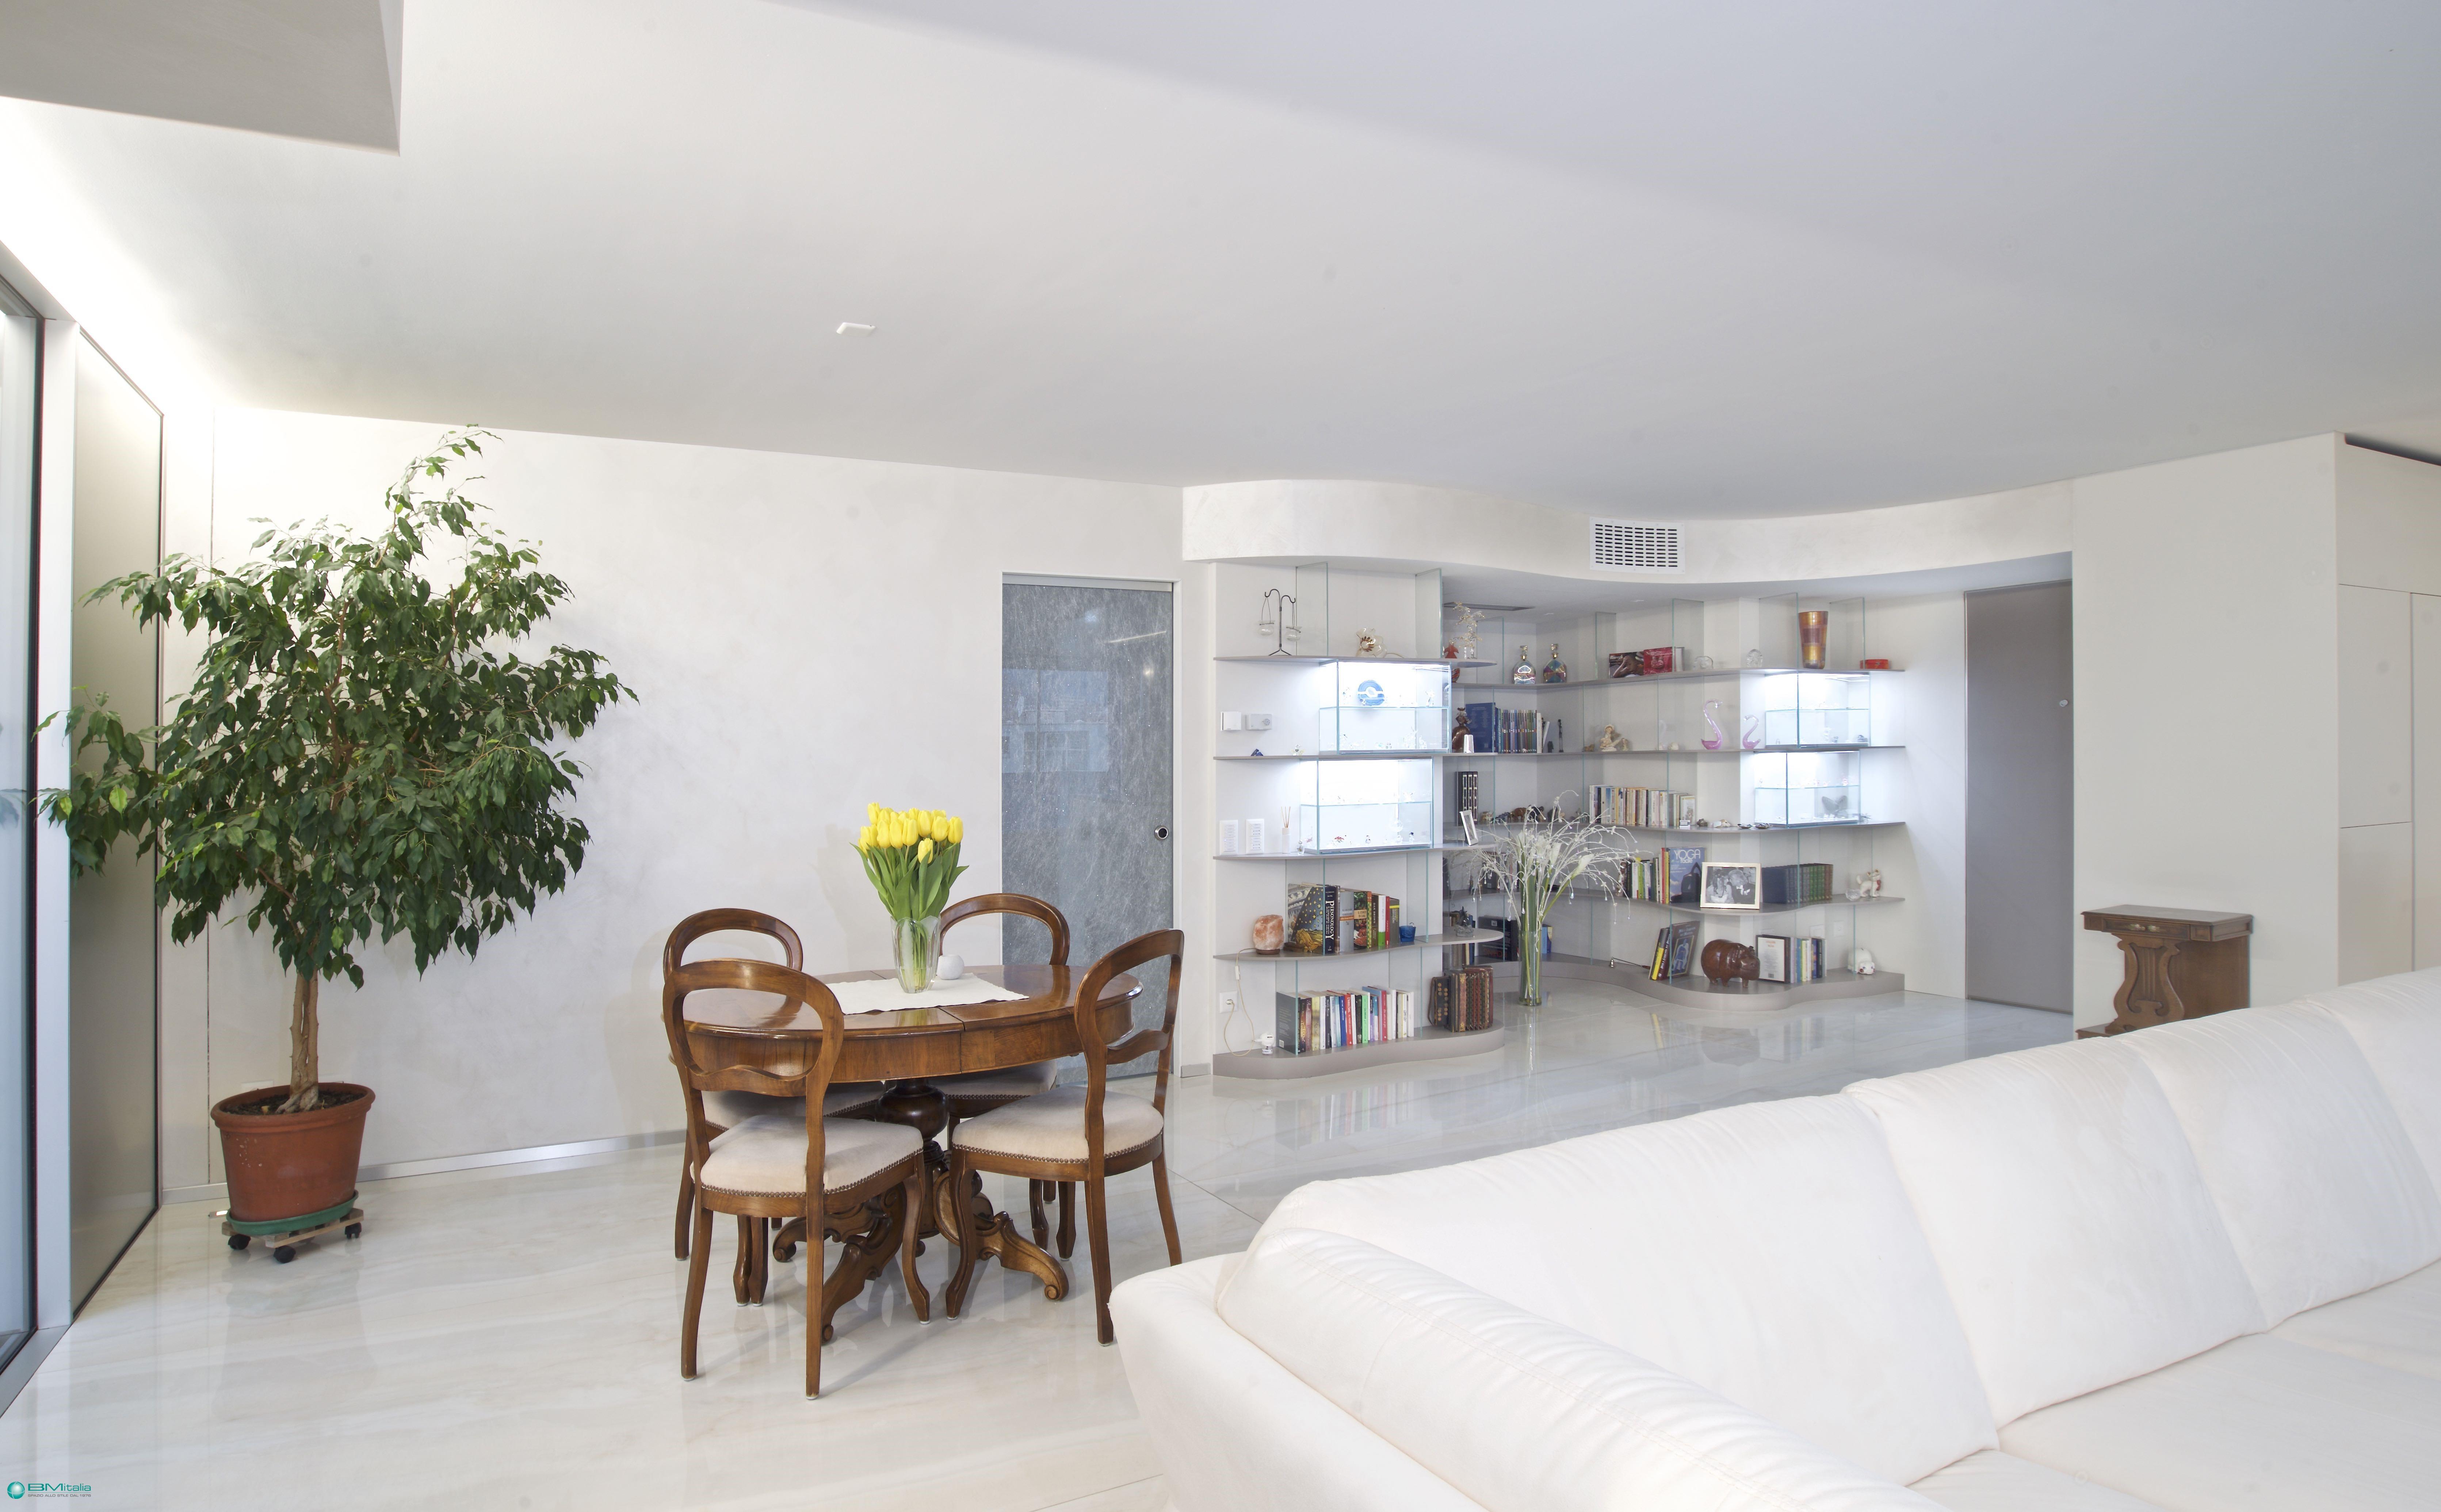 Arredamenti su misura per appartamenti di lusso ville for Arredamenti per appartamenti